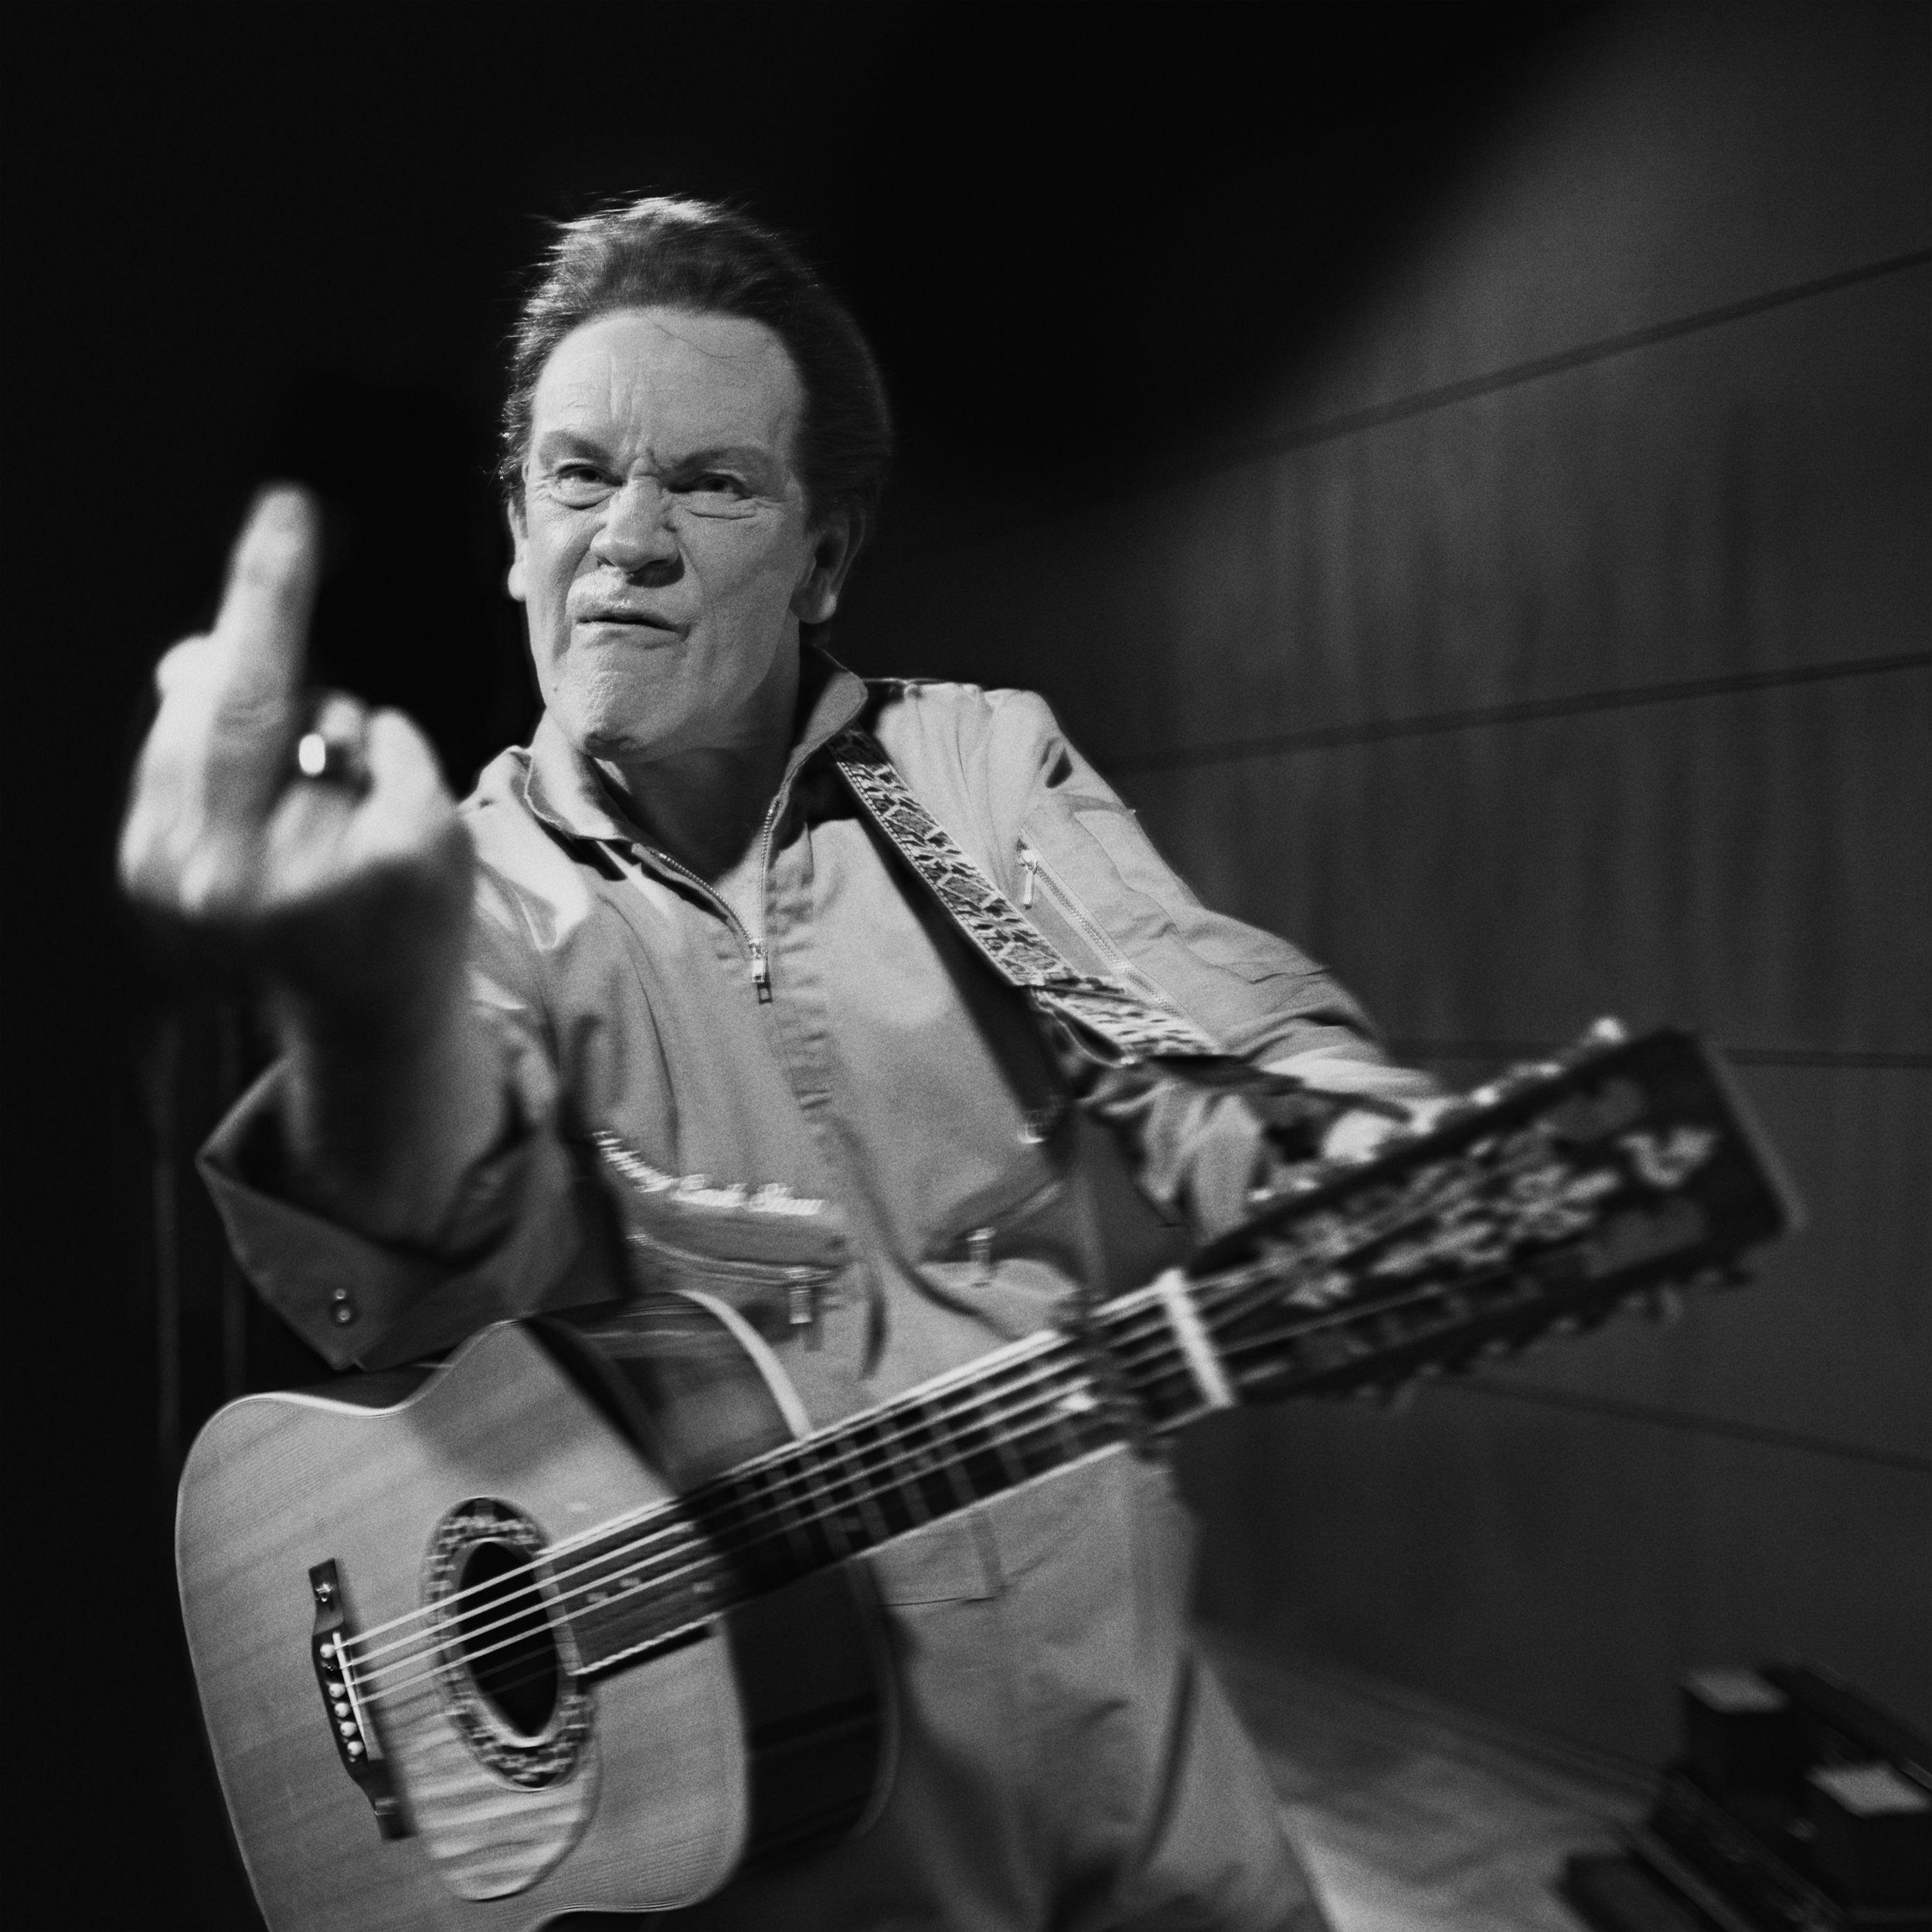 Jim Marshall / Johnny Cash, San Quentin Prison (1970), 2014